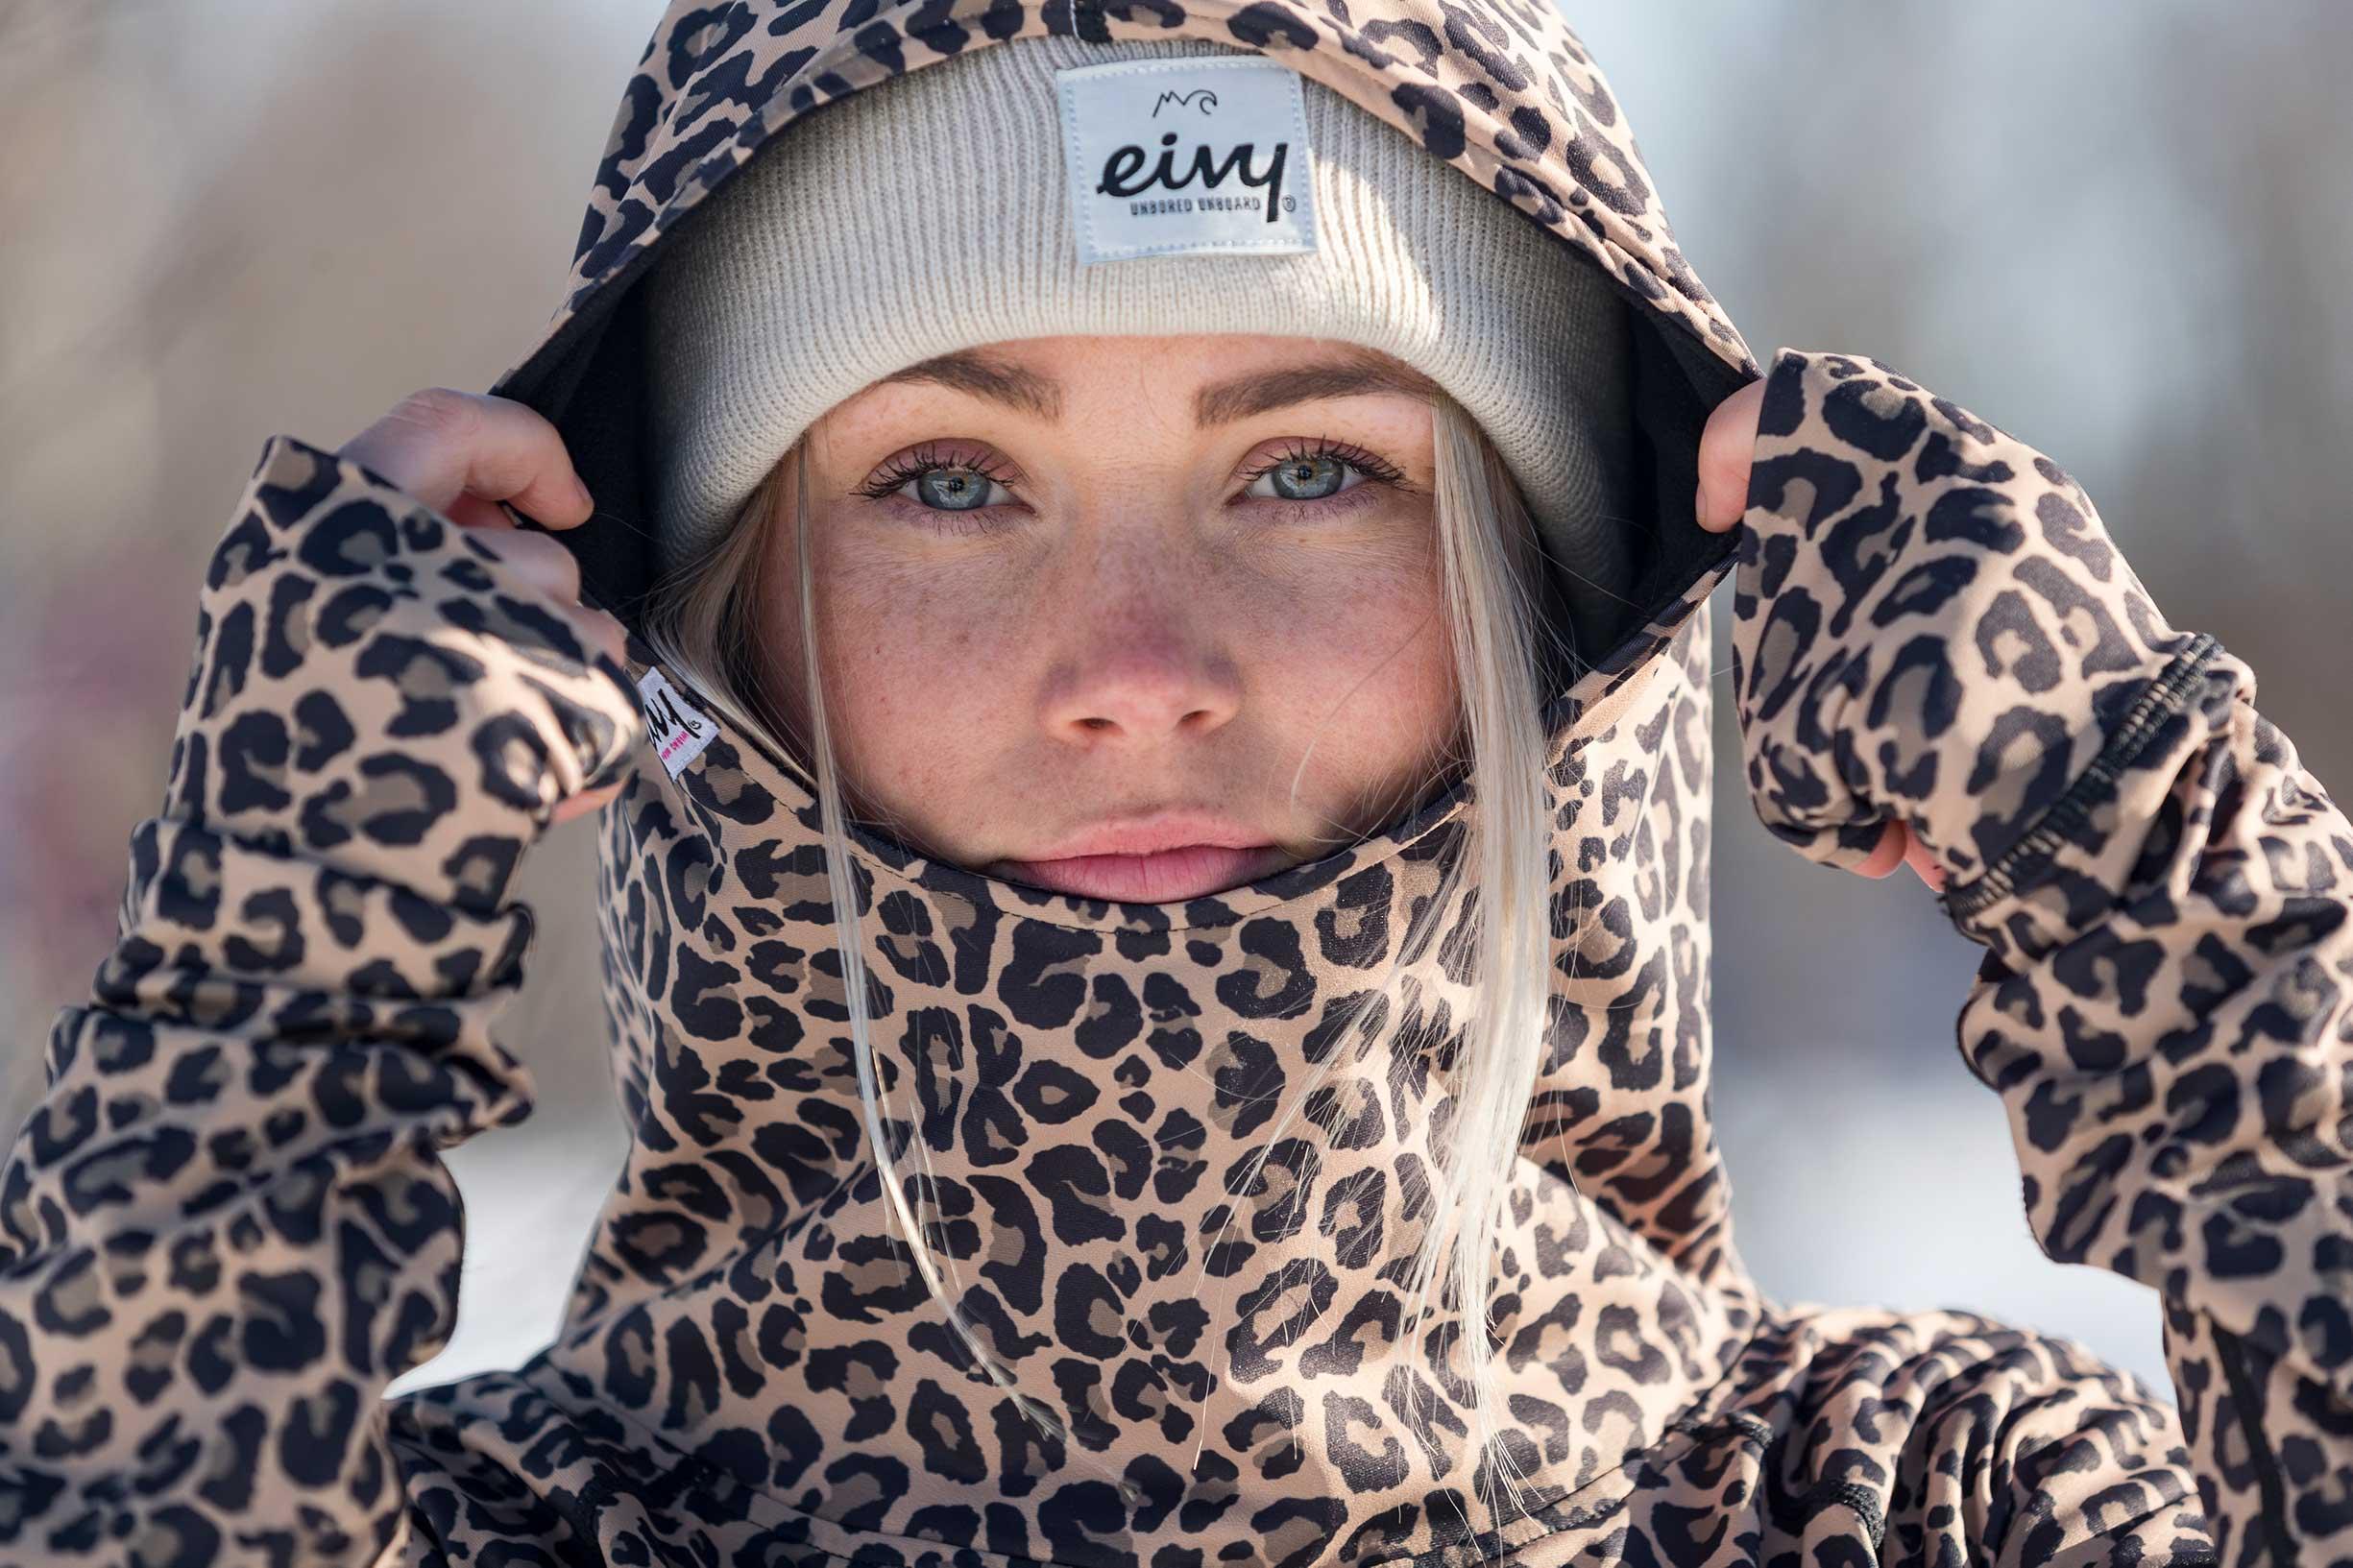 slider-image-https://www.eivyclothing.com/image/3940/leopard-ny2.jpg